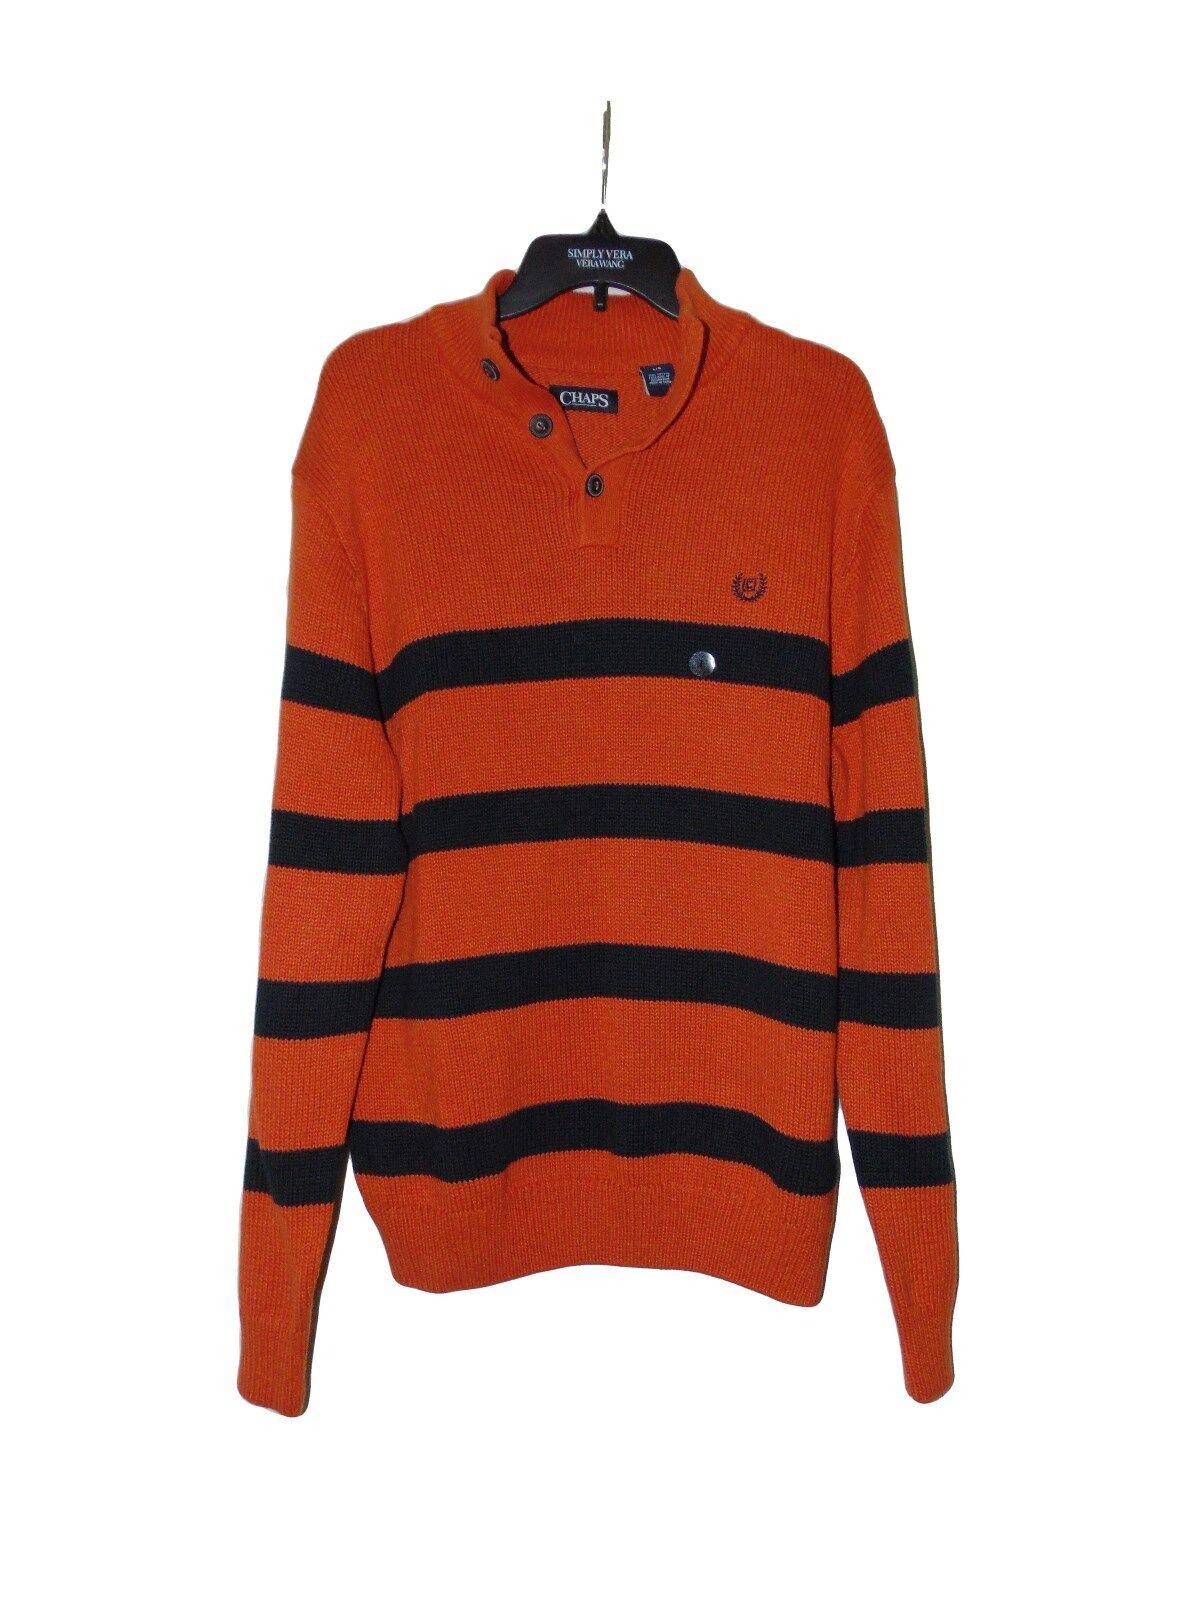 Chaps by Ralph Lauren Men's Large Navy Stripe Orange Sweater 3 ...